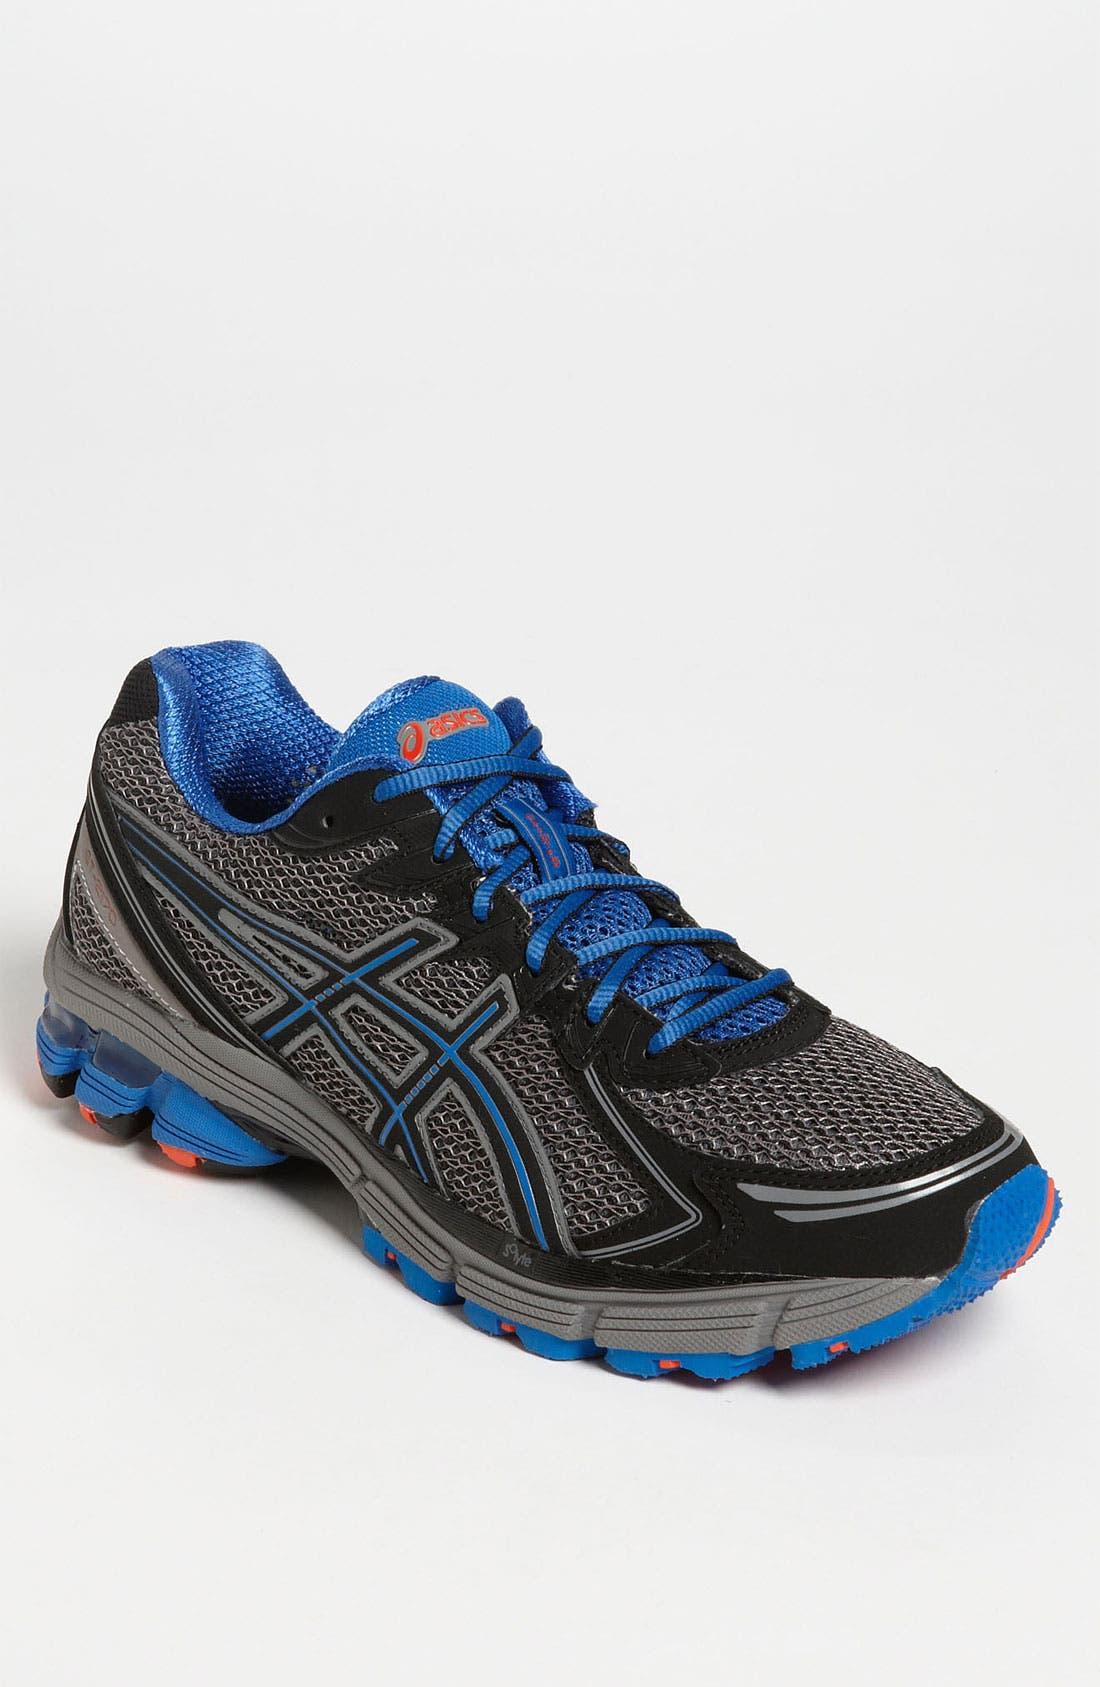 Main Image - ASICS® 'GT-2170™' Trail Running Shoe (Men)